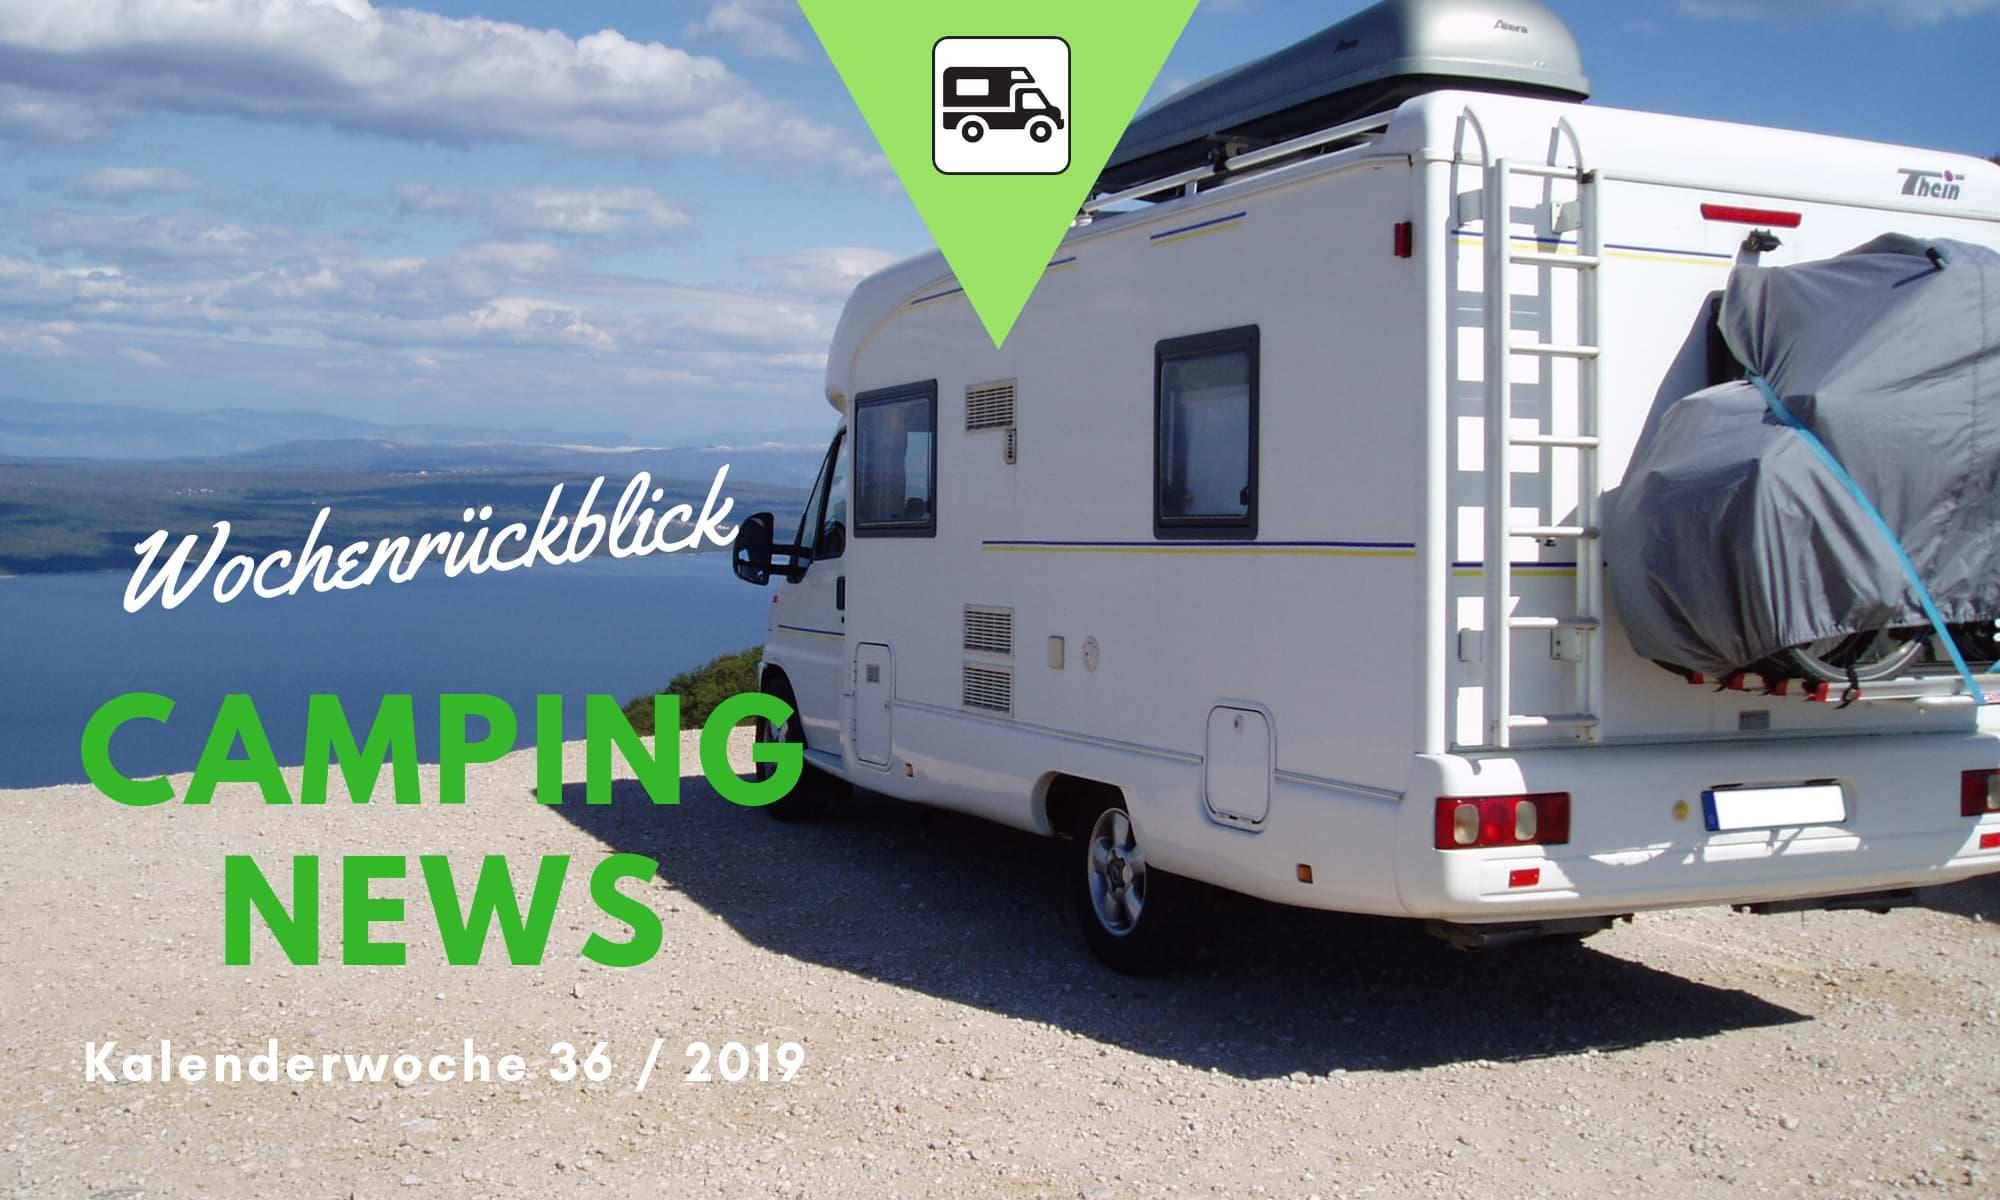 Wochenrückblick Camping News KW36-2019